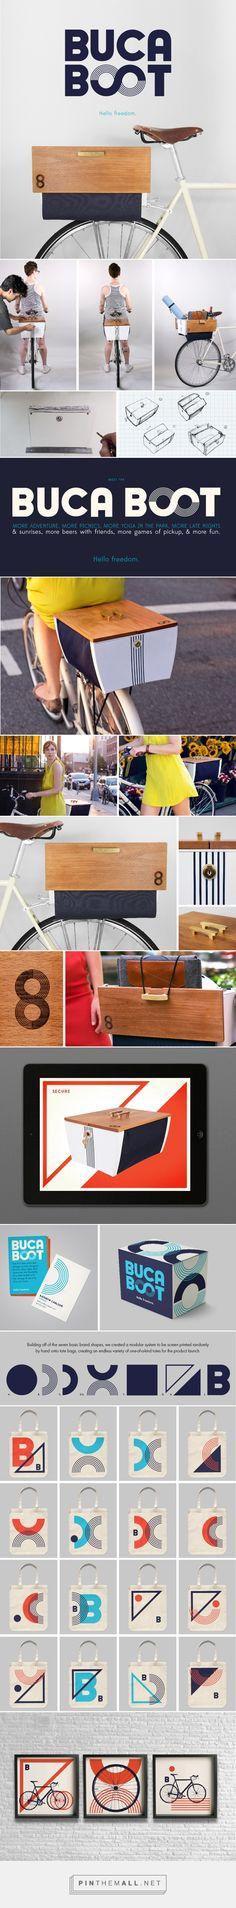 Buca Boot Branding & Product Design on Behance - created via http://pinthemall.net